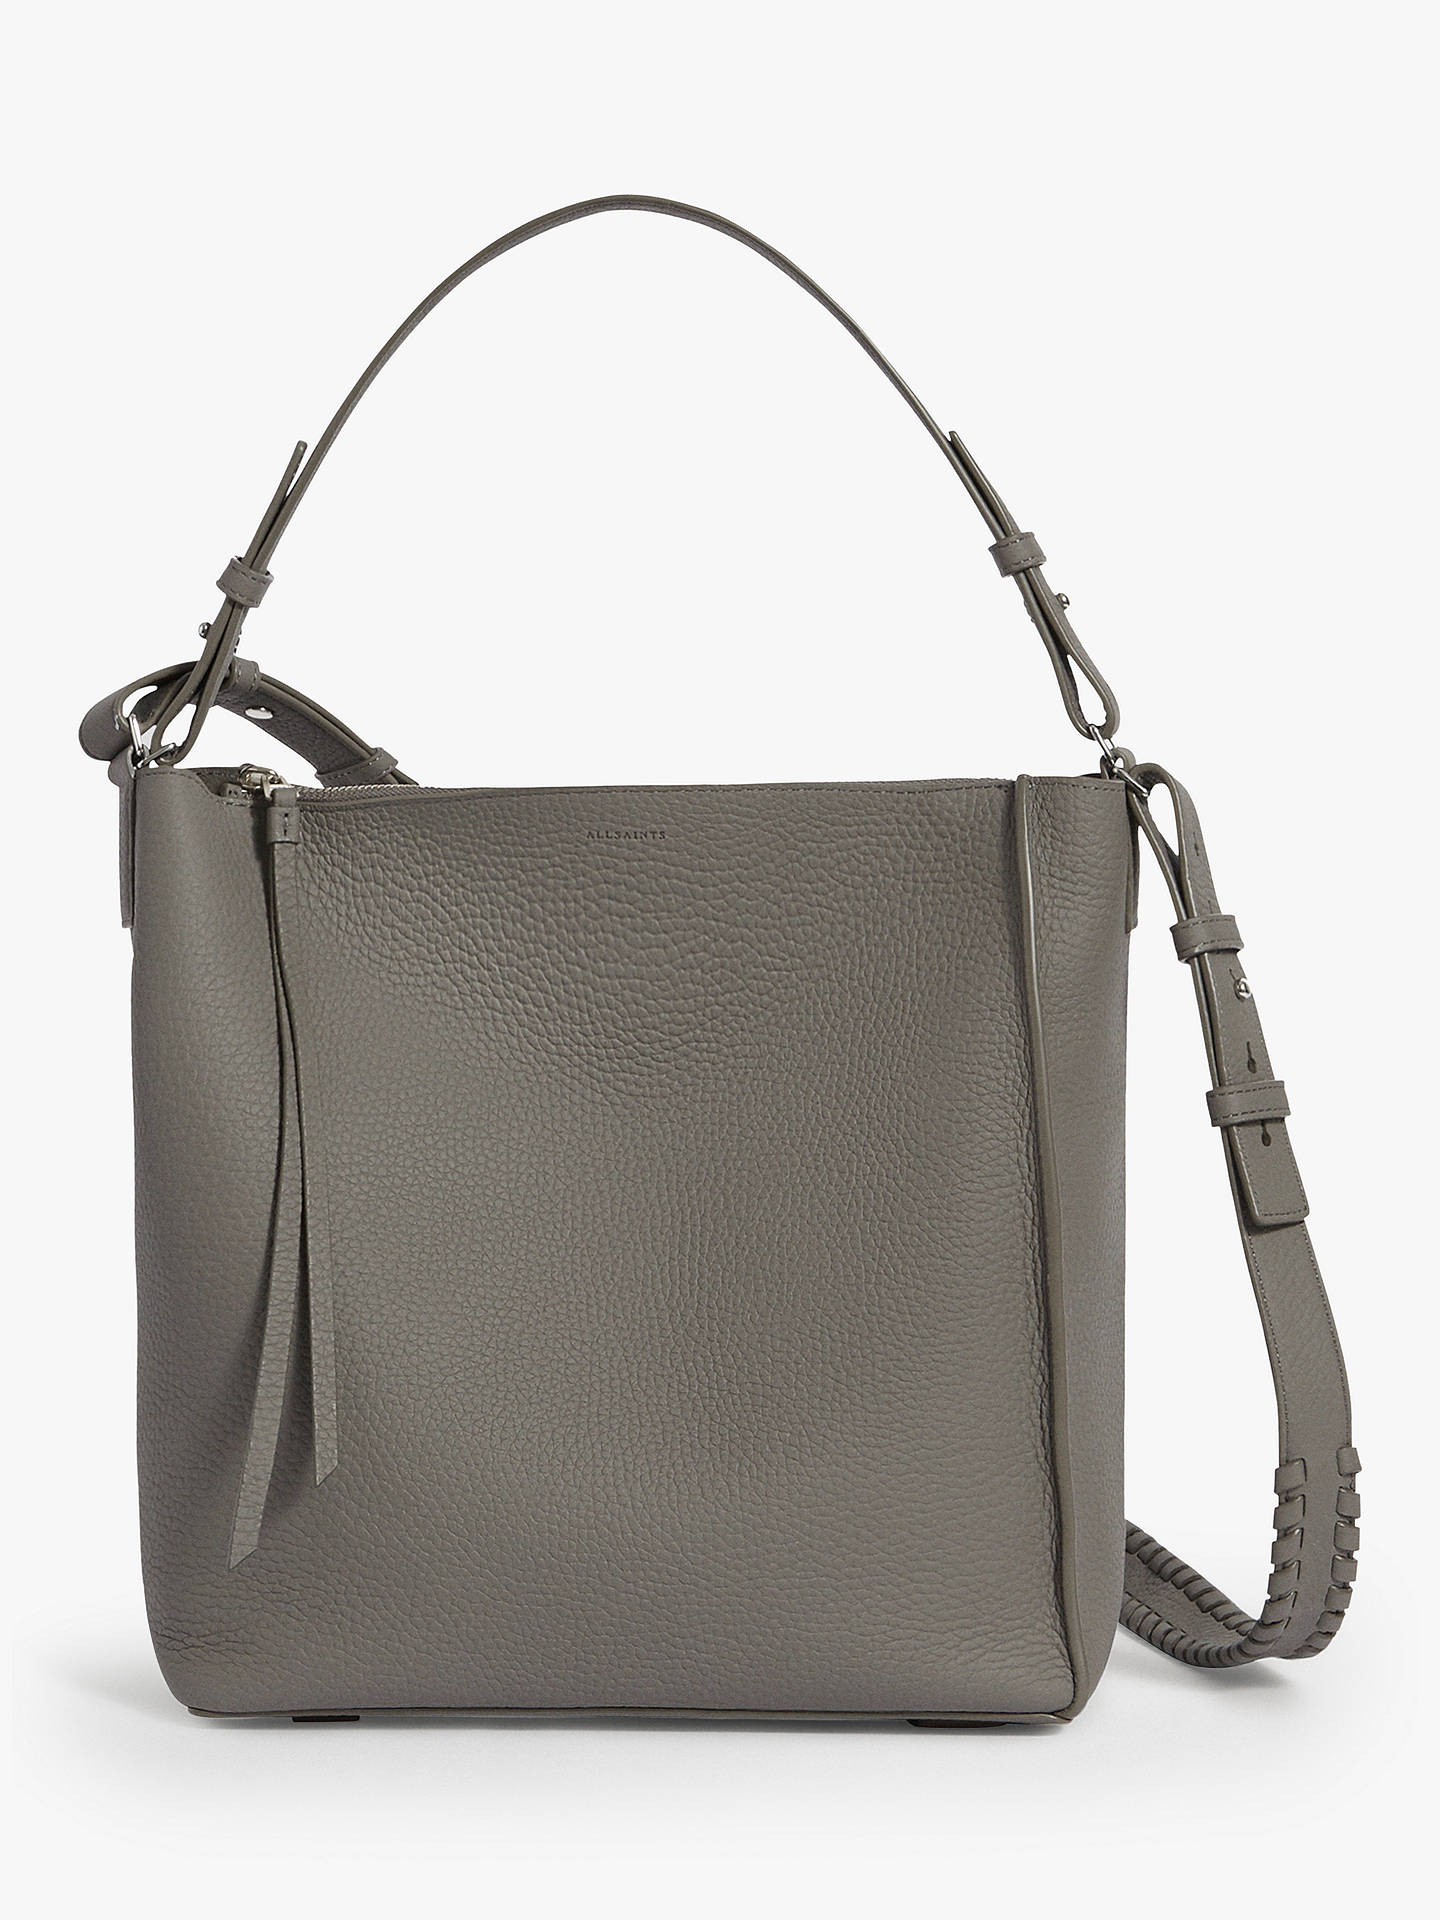 ae17a2fee0b6c5 Buy AllSaints Kita Cross Body Bag, Storm Grey Online at johnlewis.com ...